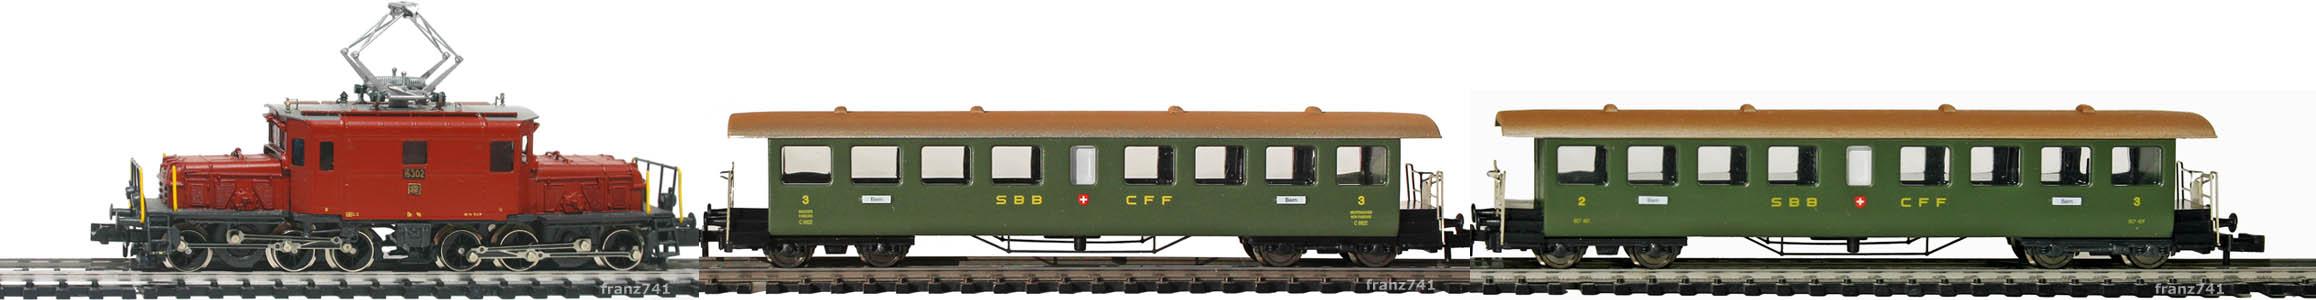 Epoche-III-SBB-Seetaler-Personenzug_De-6-6-Elok-B4-BC4-Seetalwagen